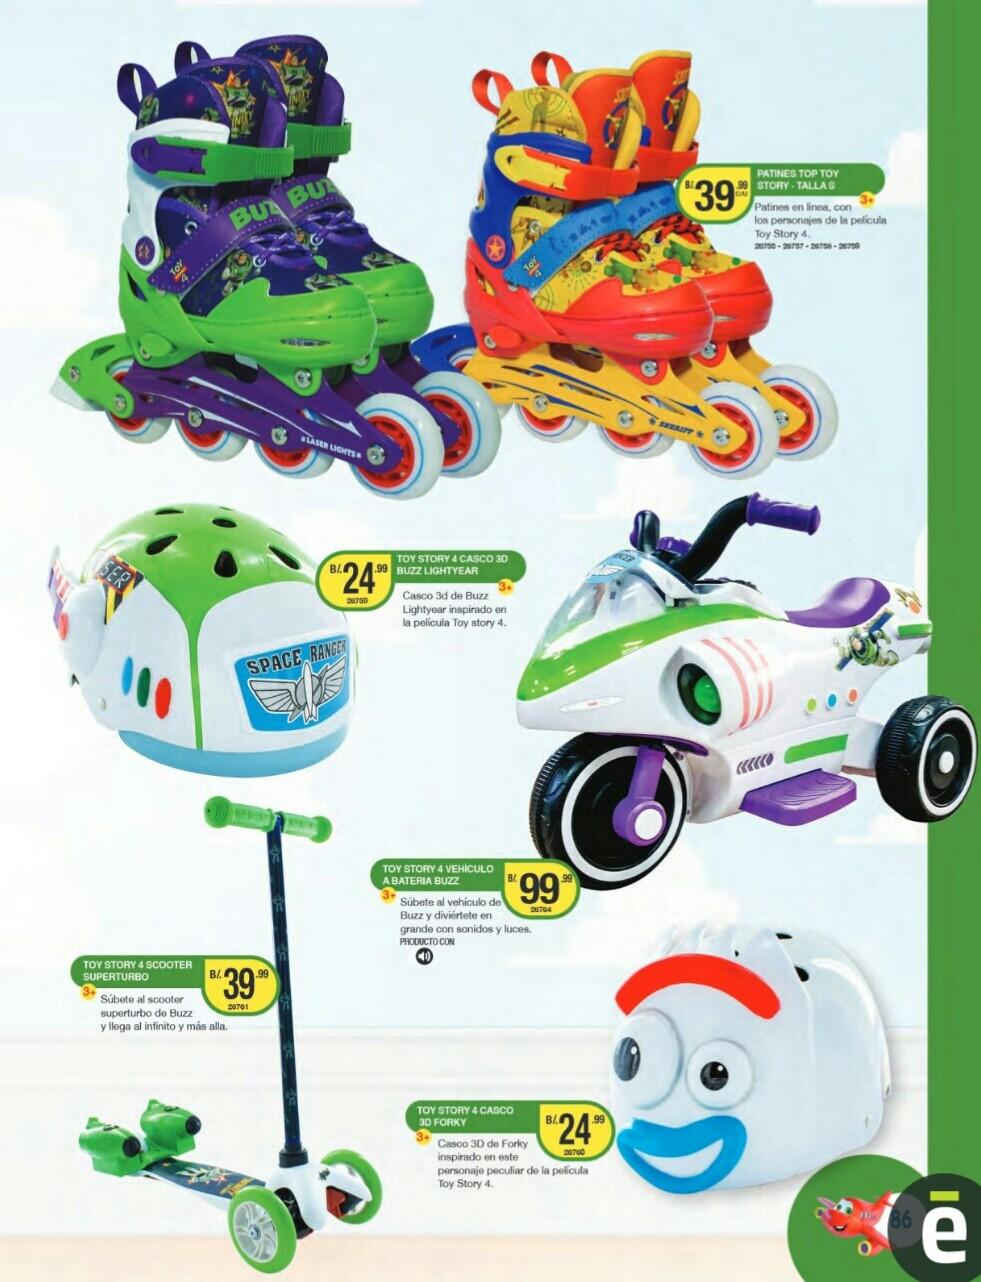 Catalogo juguetes Titan Toys 2019 p86